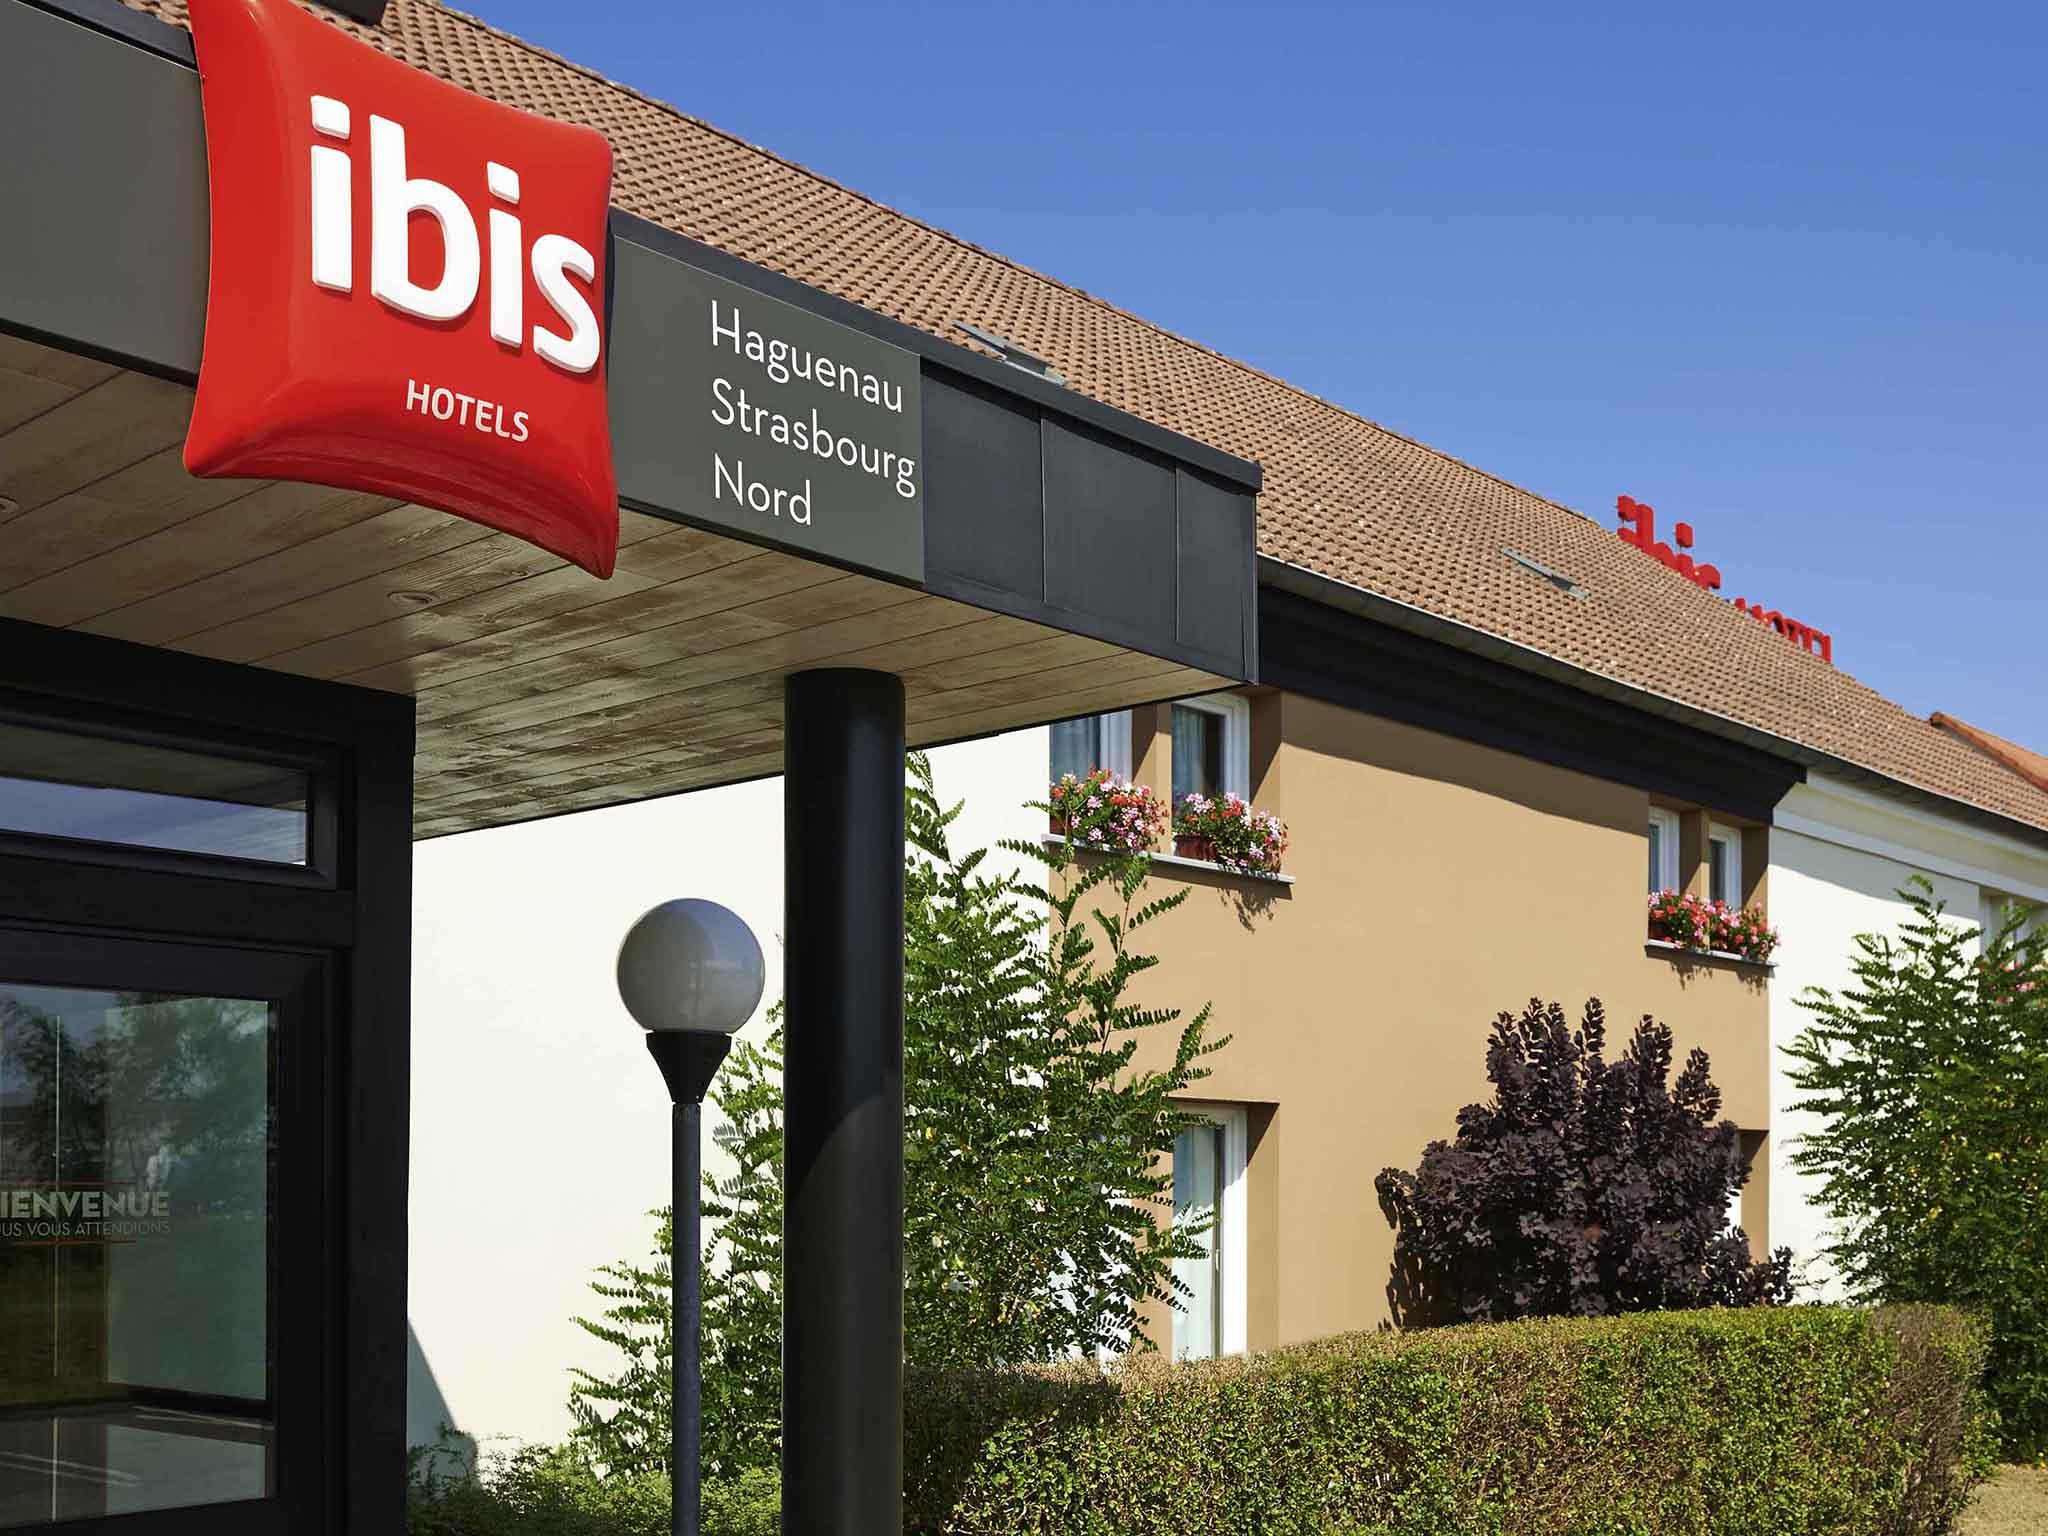 Hotel Ibis Haguenau Strasbourg Nord Haguenau